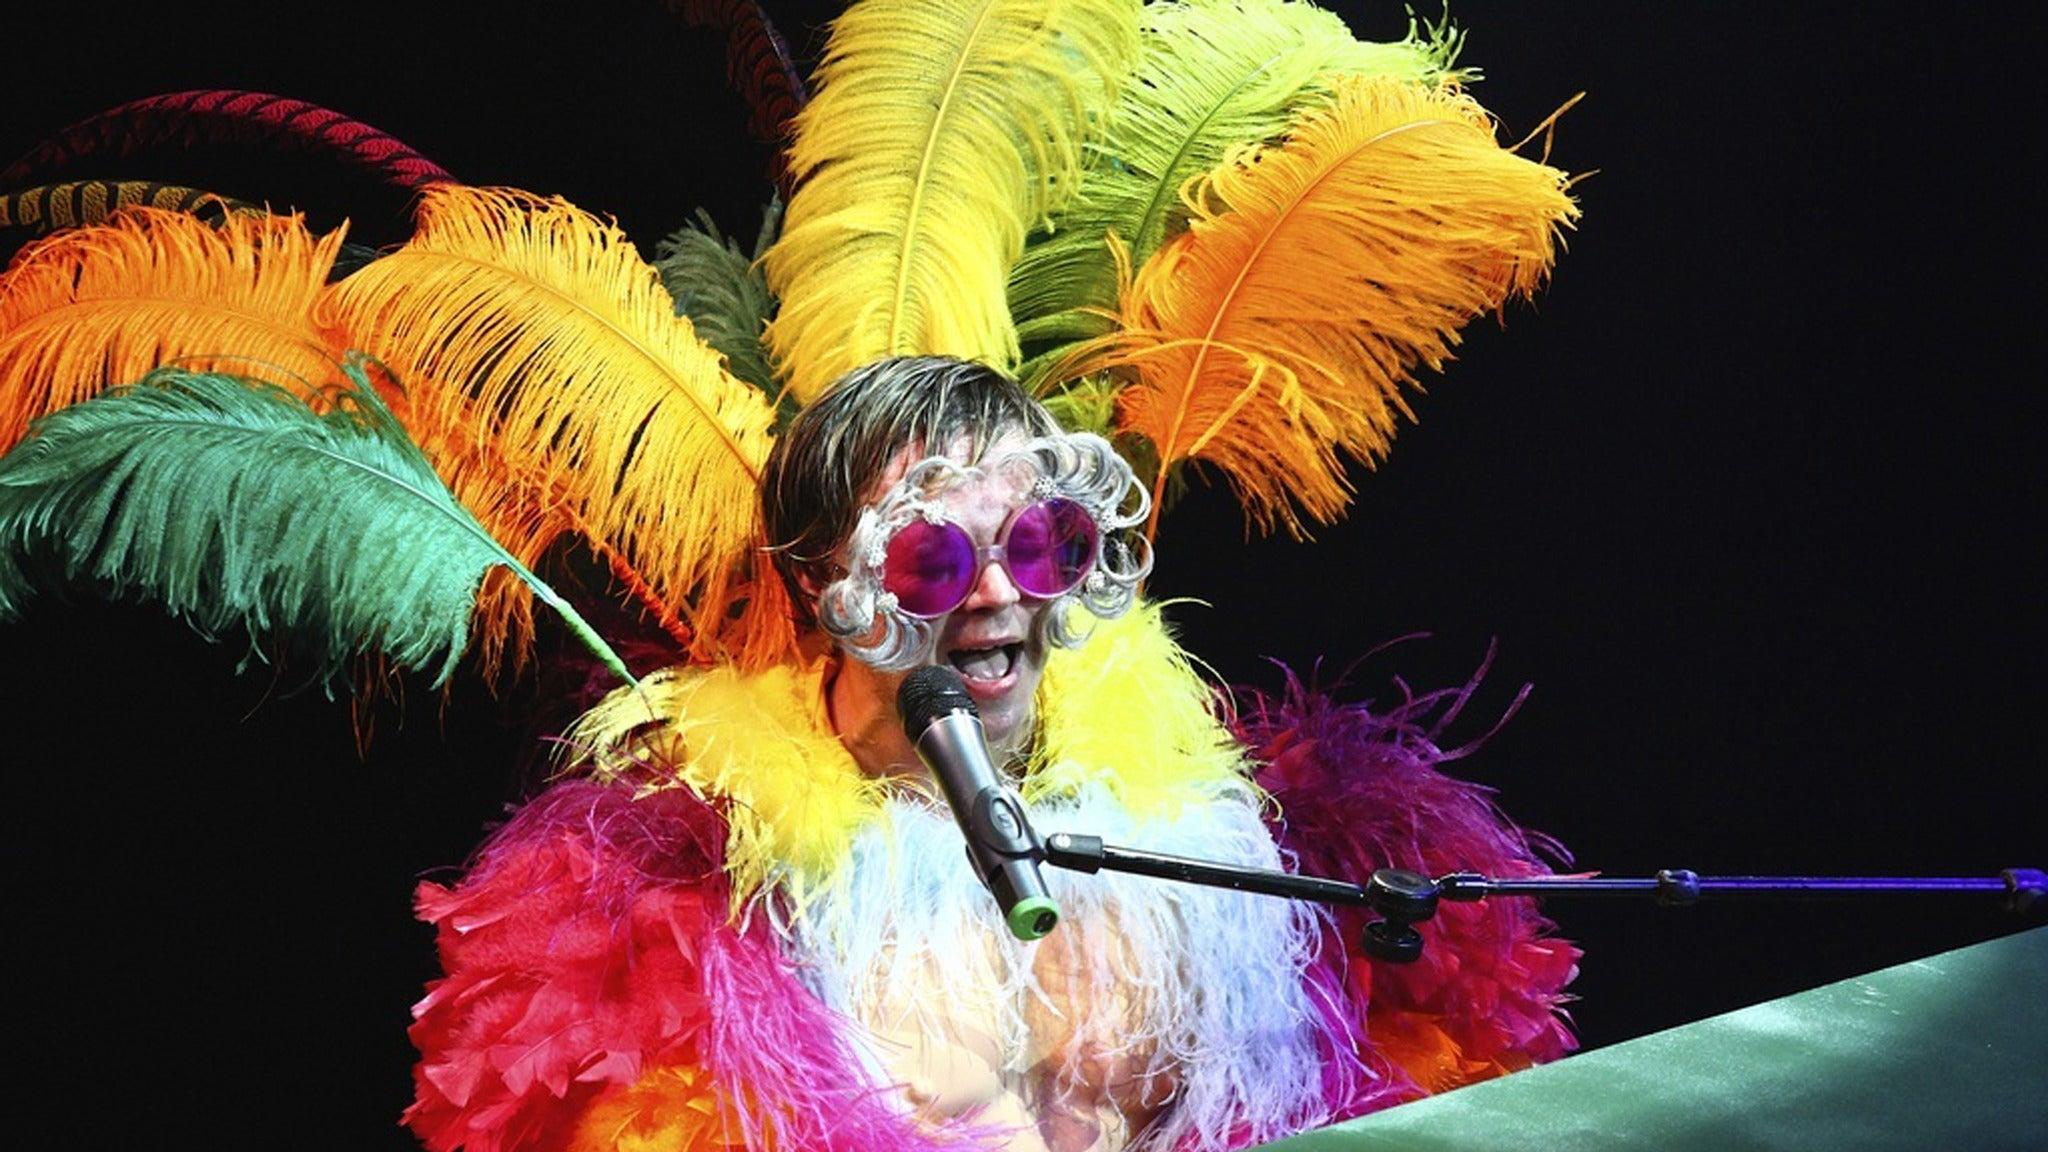 Star Spangled Summer: ROCKET MAN - Elton John Tribute